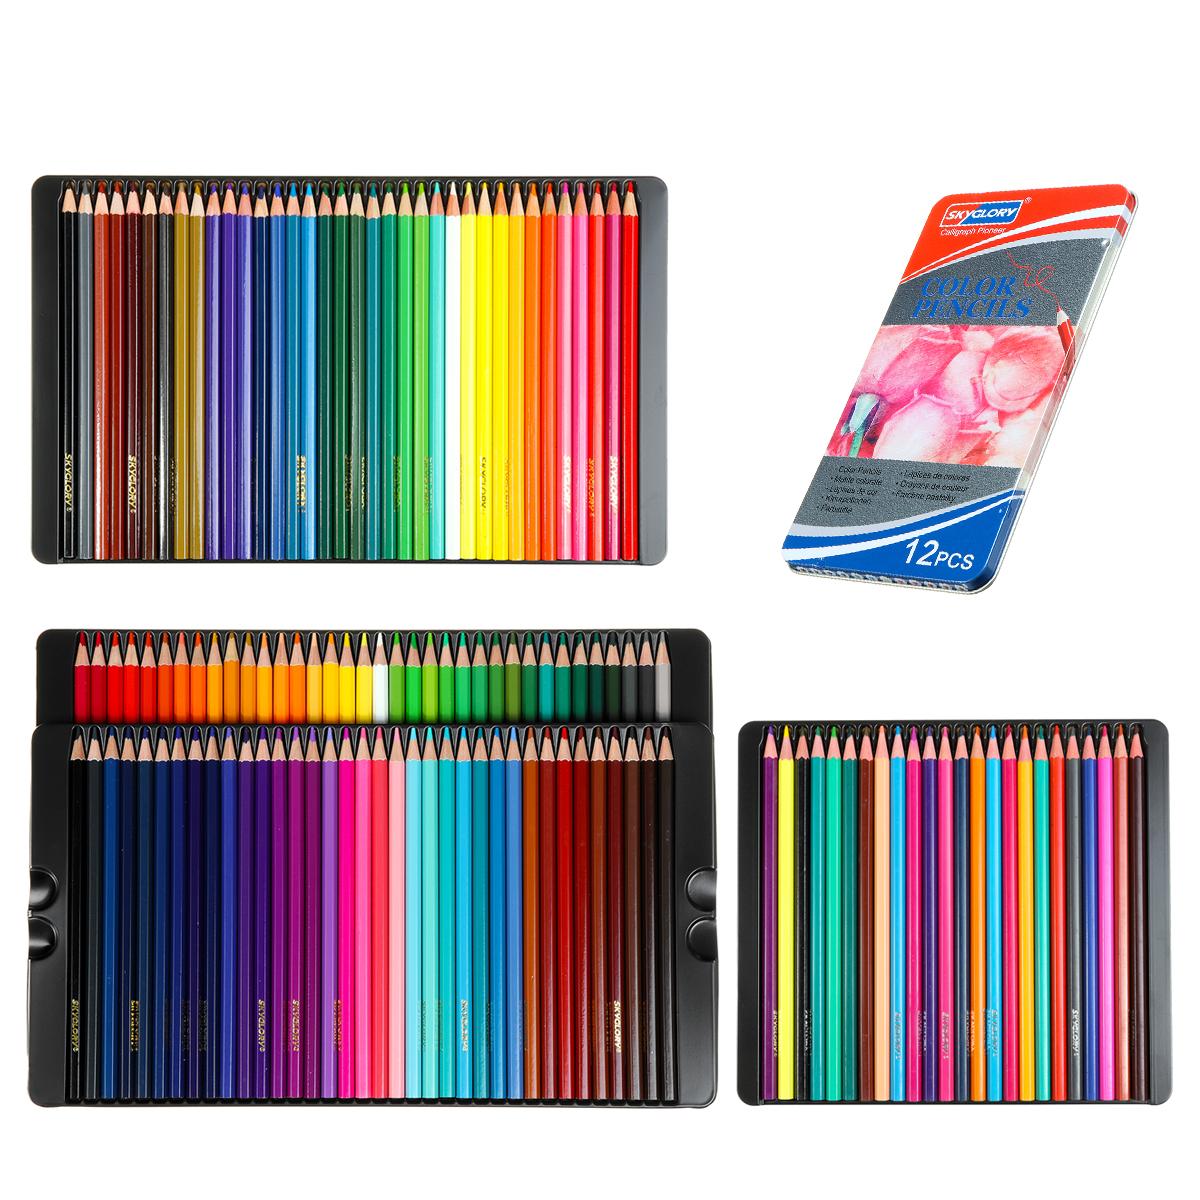 12/24/36/72 Colors Professional Oil Colored Pencils Set Artist Painting Sketching Wood Color Pencil School Art Supplies